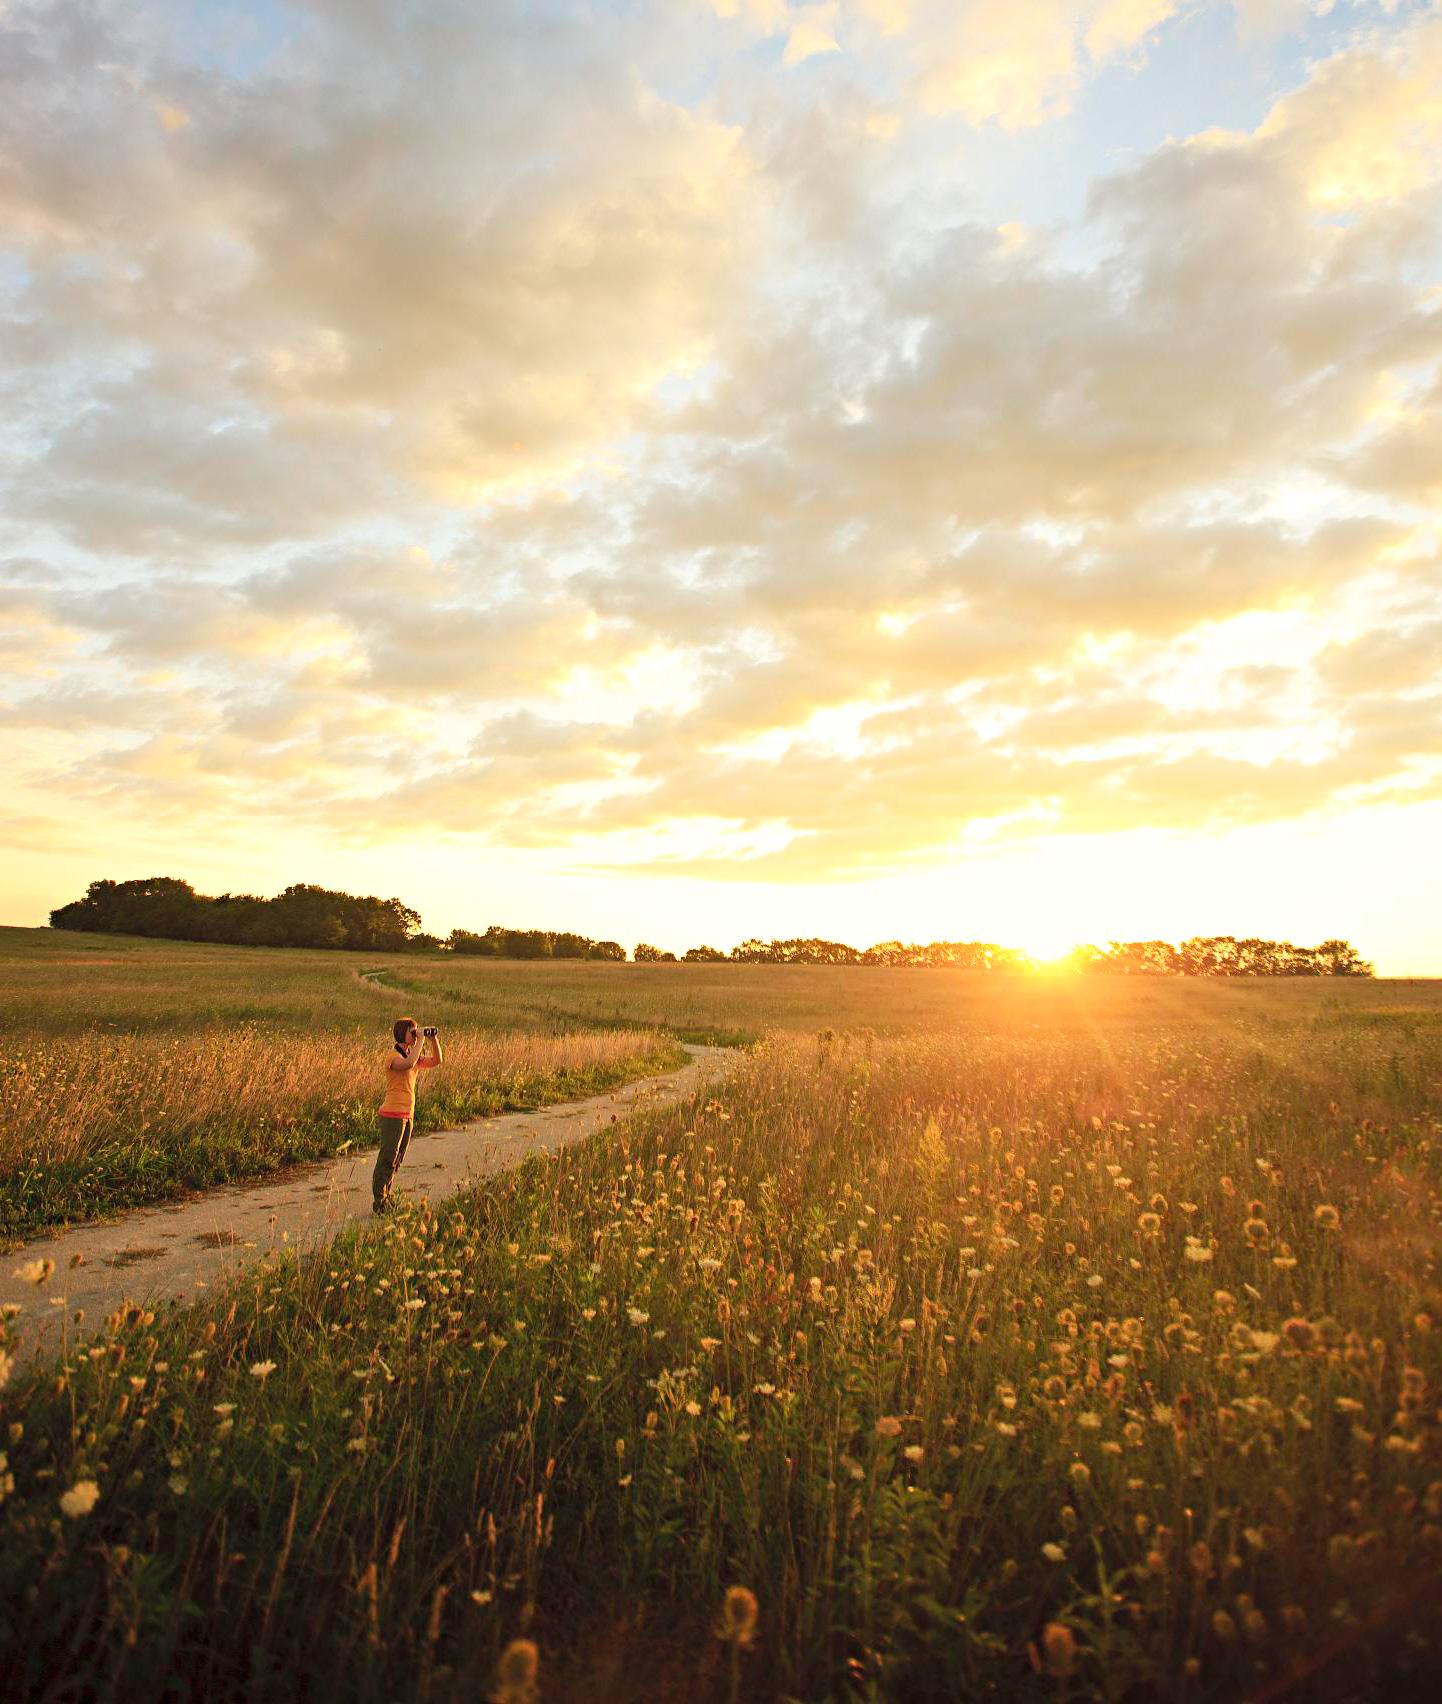 Midewin National Tallgrass Prairie: 60 miles southwest of Chicago